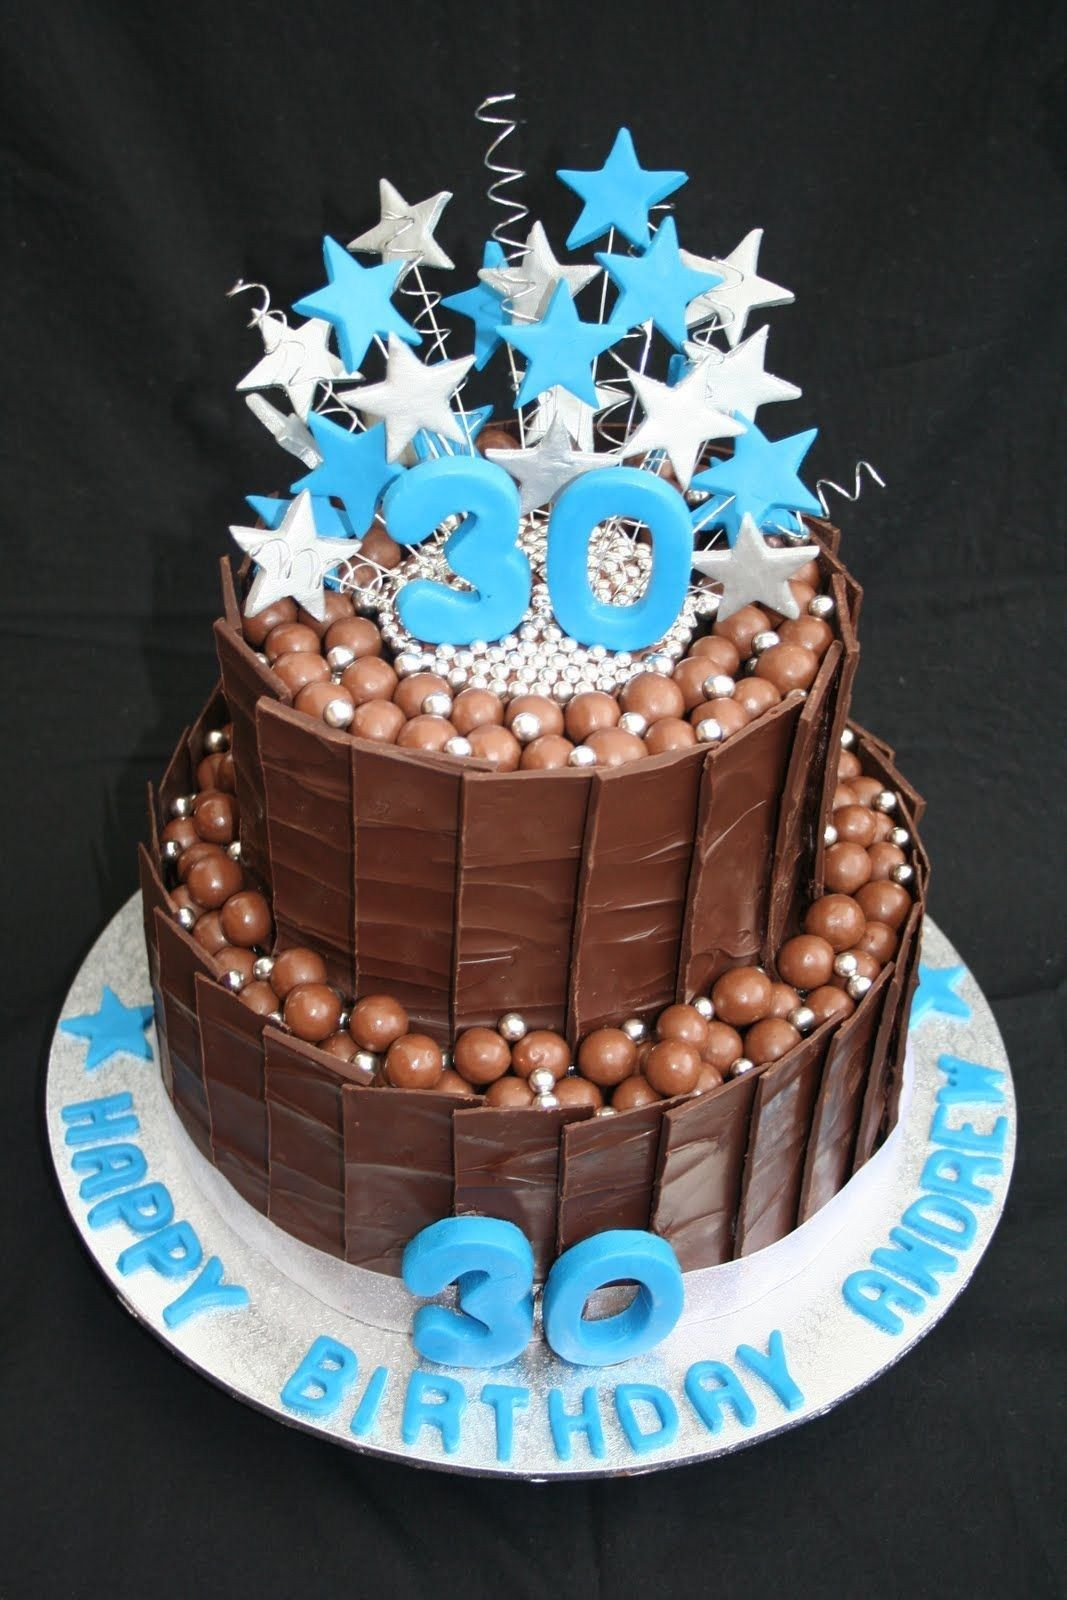 25 amazing photo of 30th birthday cake ideas for him